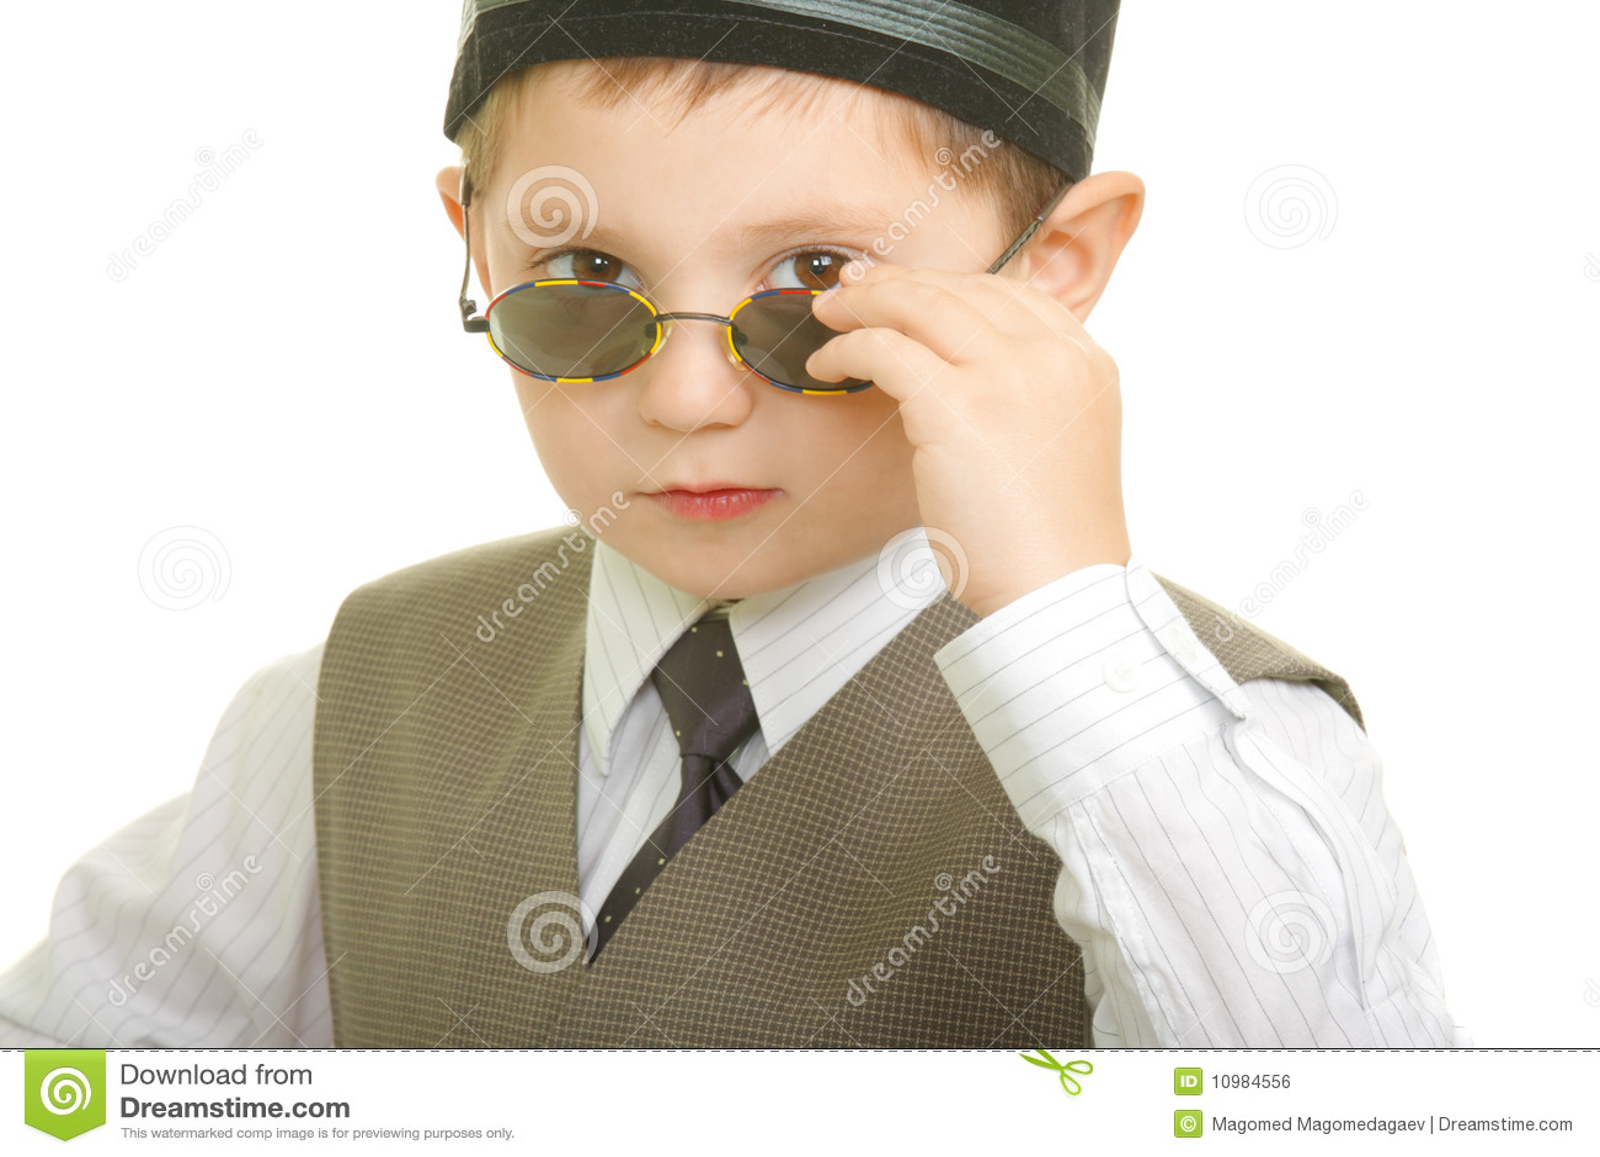 b34743df9fdb Kid in sunglasses stock photo. Image of shirt, child - 10984556